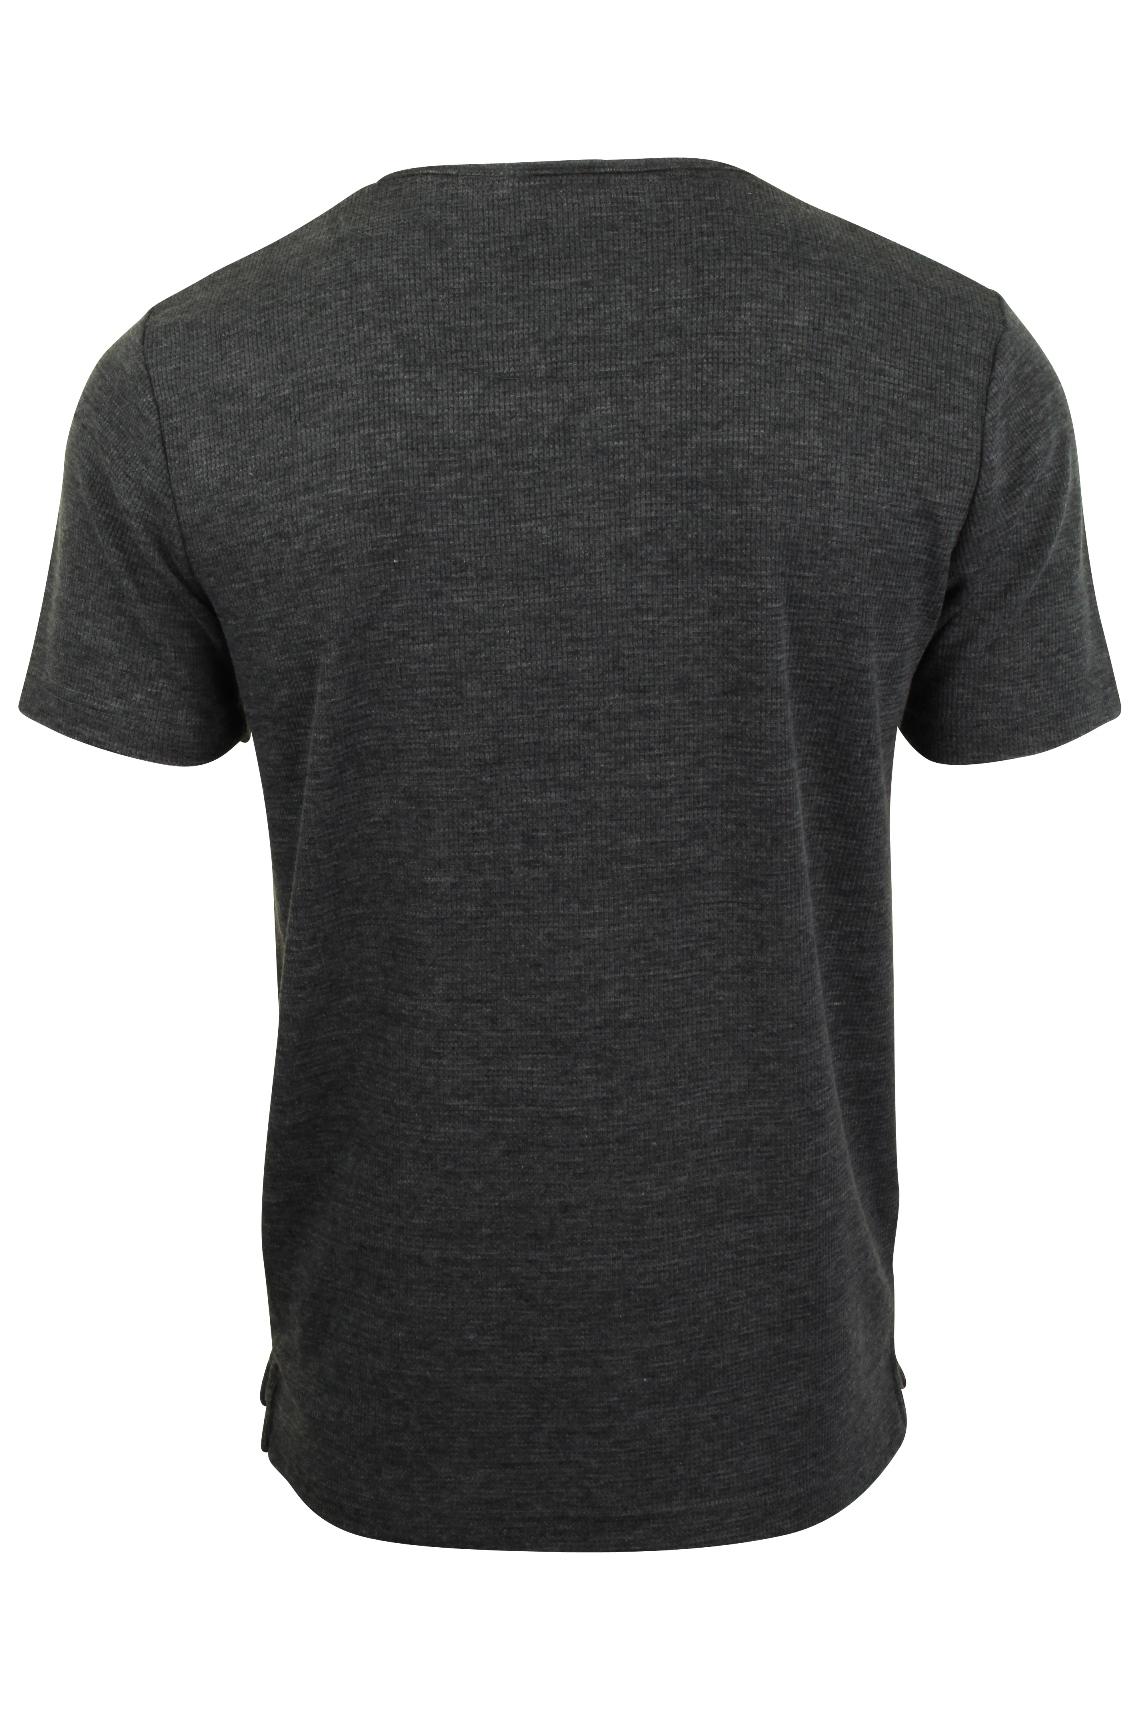 Mens-Tokyo-Laundry-Grandad-T-Shirt-Waffle-Burn-Out-Fabric thumbnail 5